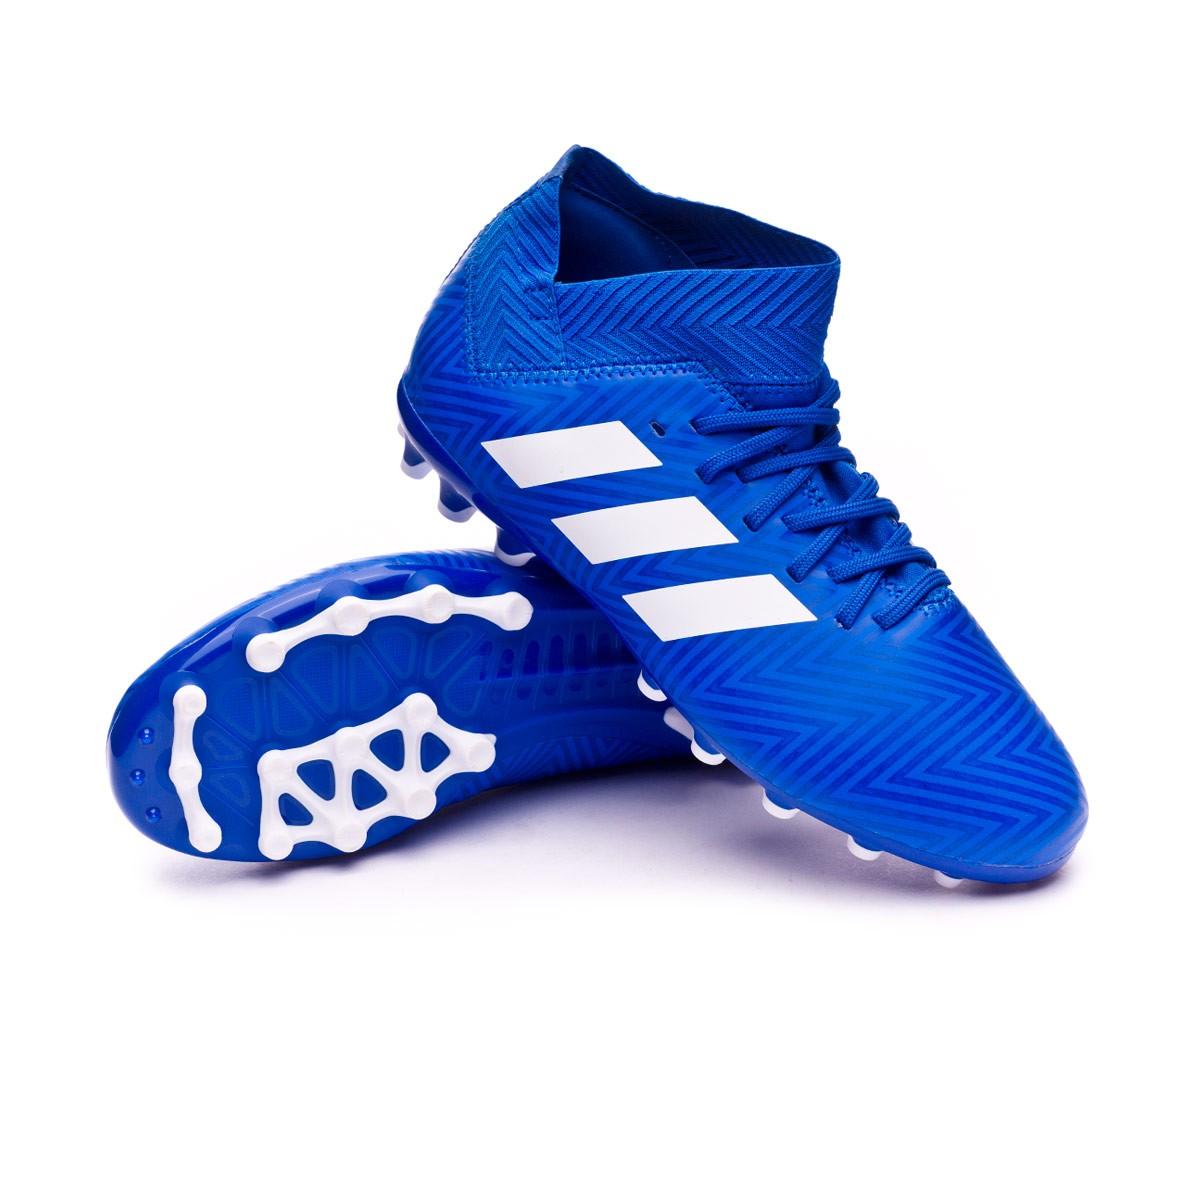 adidas Nemeziz 18.3 AG Junior CG7164 | Football boots